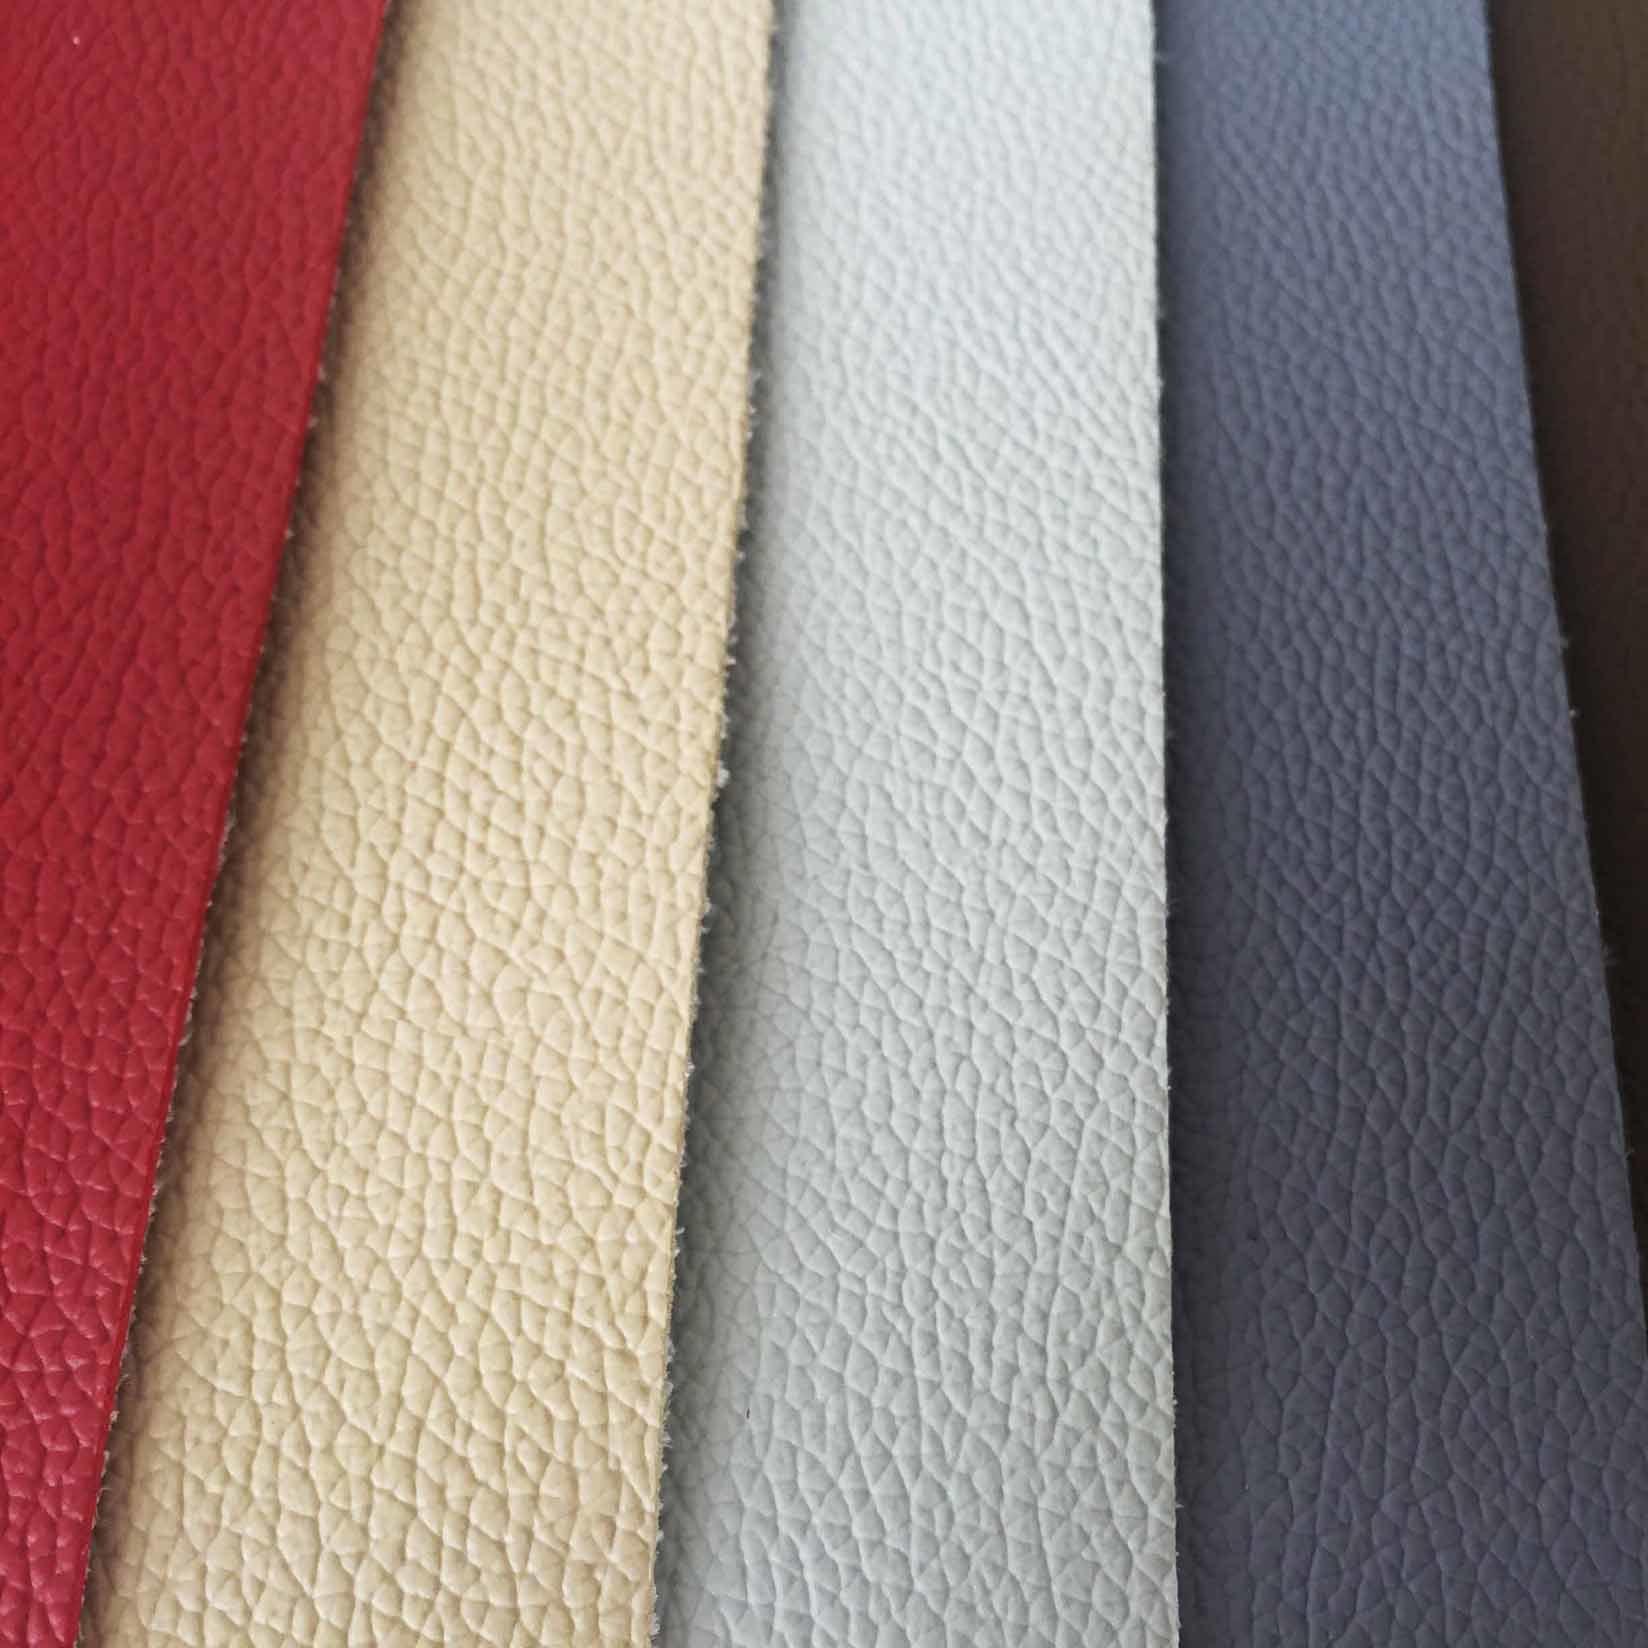 Op Selling High Quliaty Furniture Leather PVC PU Leather Mg25632